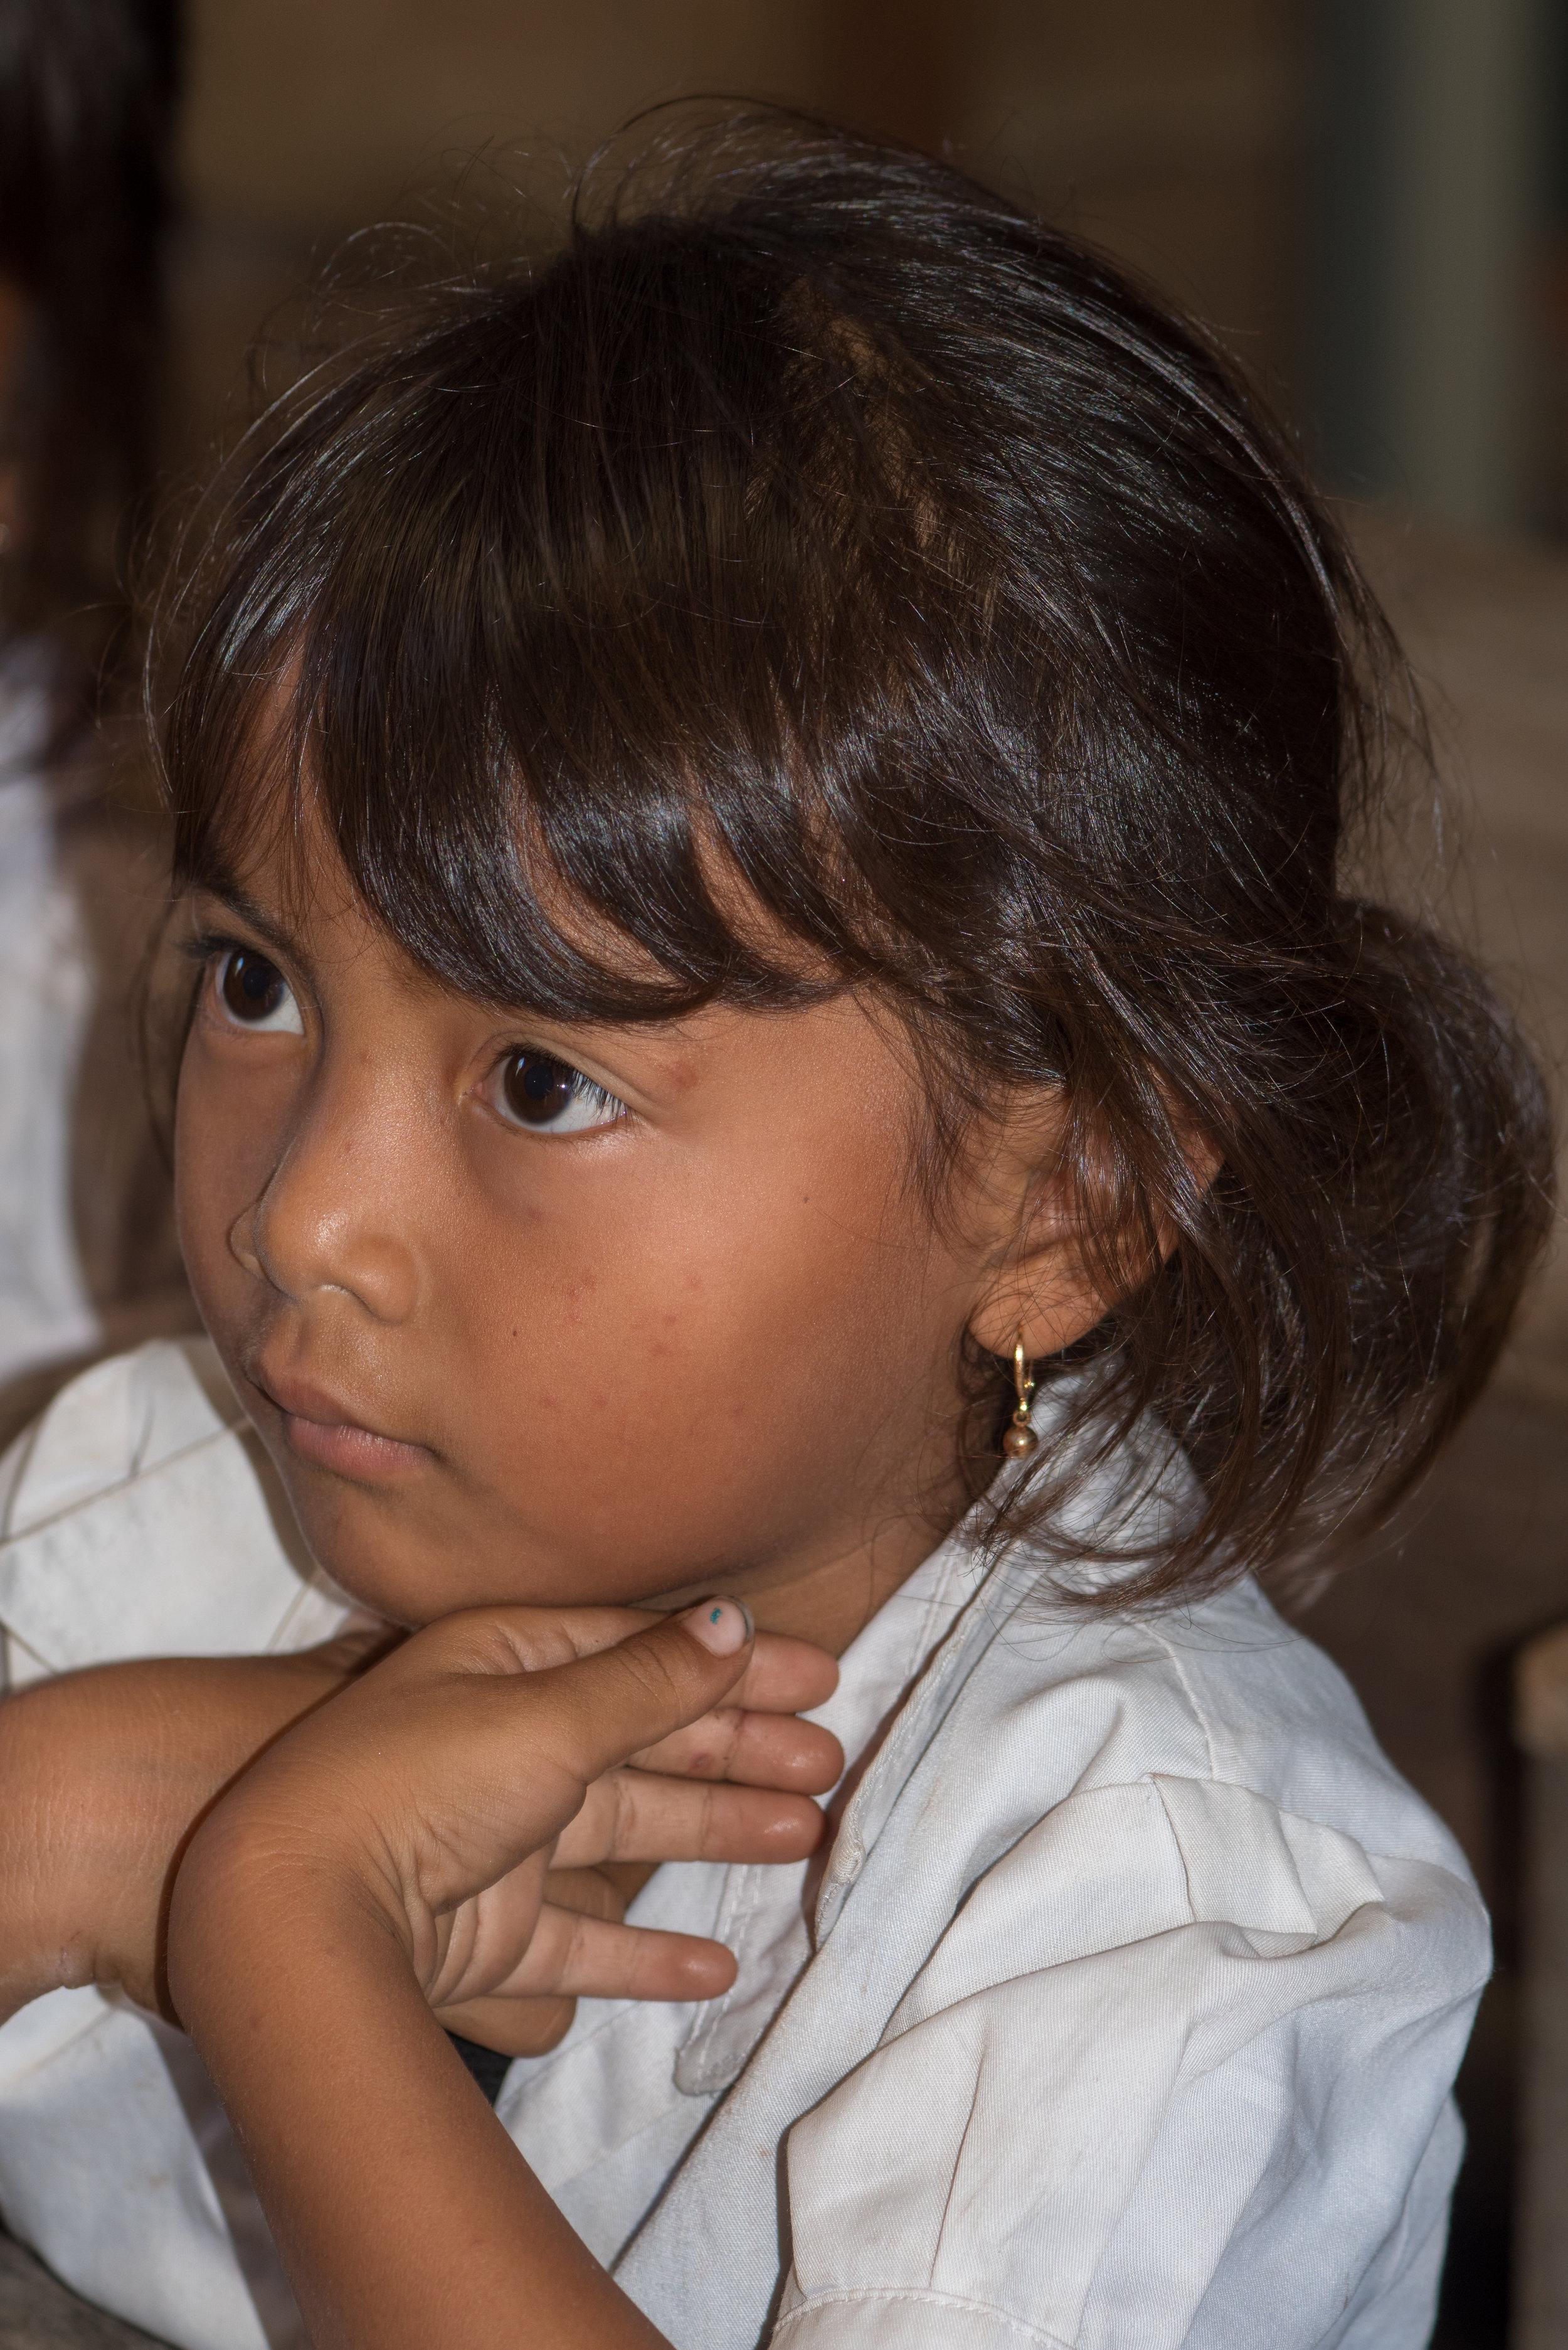 Schoolgirl, Koh Kong Knong Village, Cardamom Mountains, Cambodia